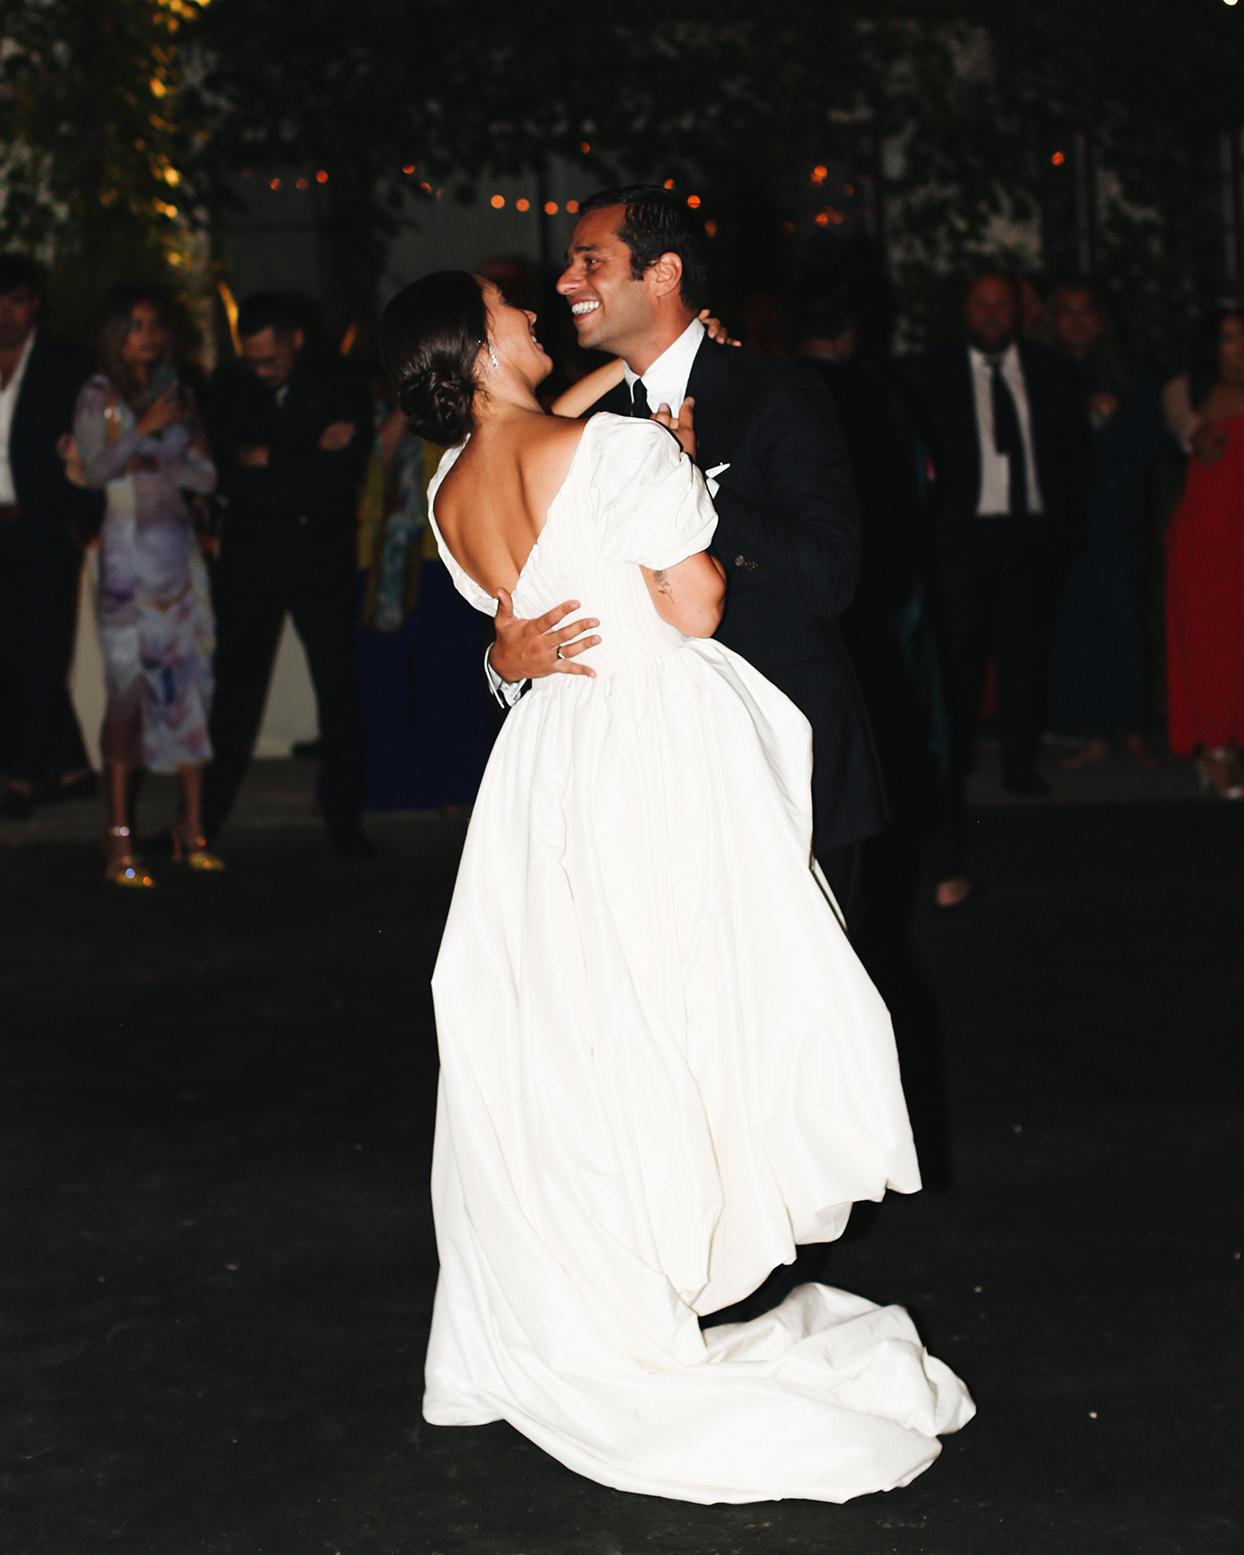 pia david wedding couple first dance